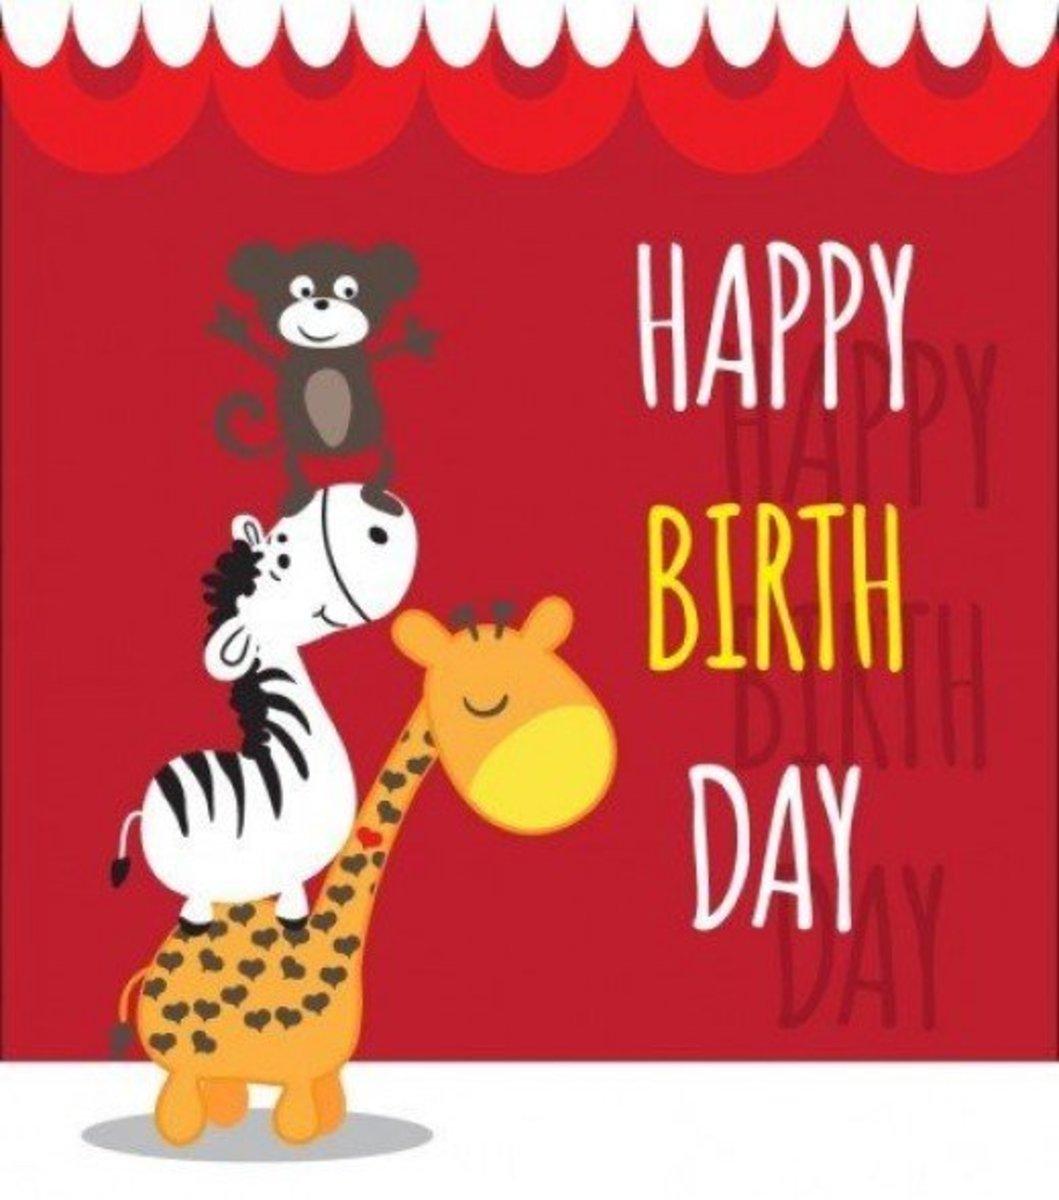 Happy Birthday with Giraffe, Zebra and Monkey